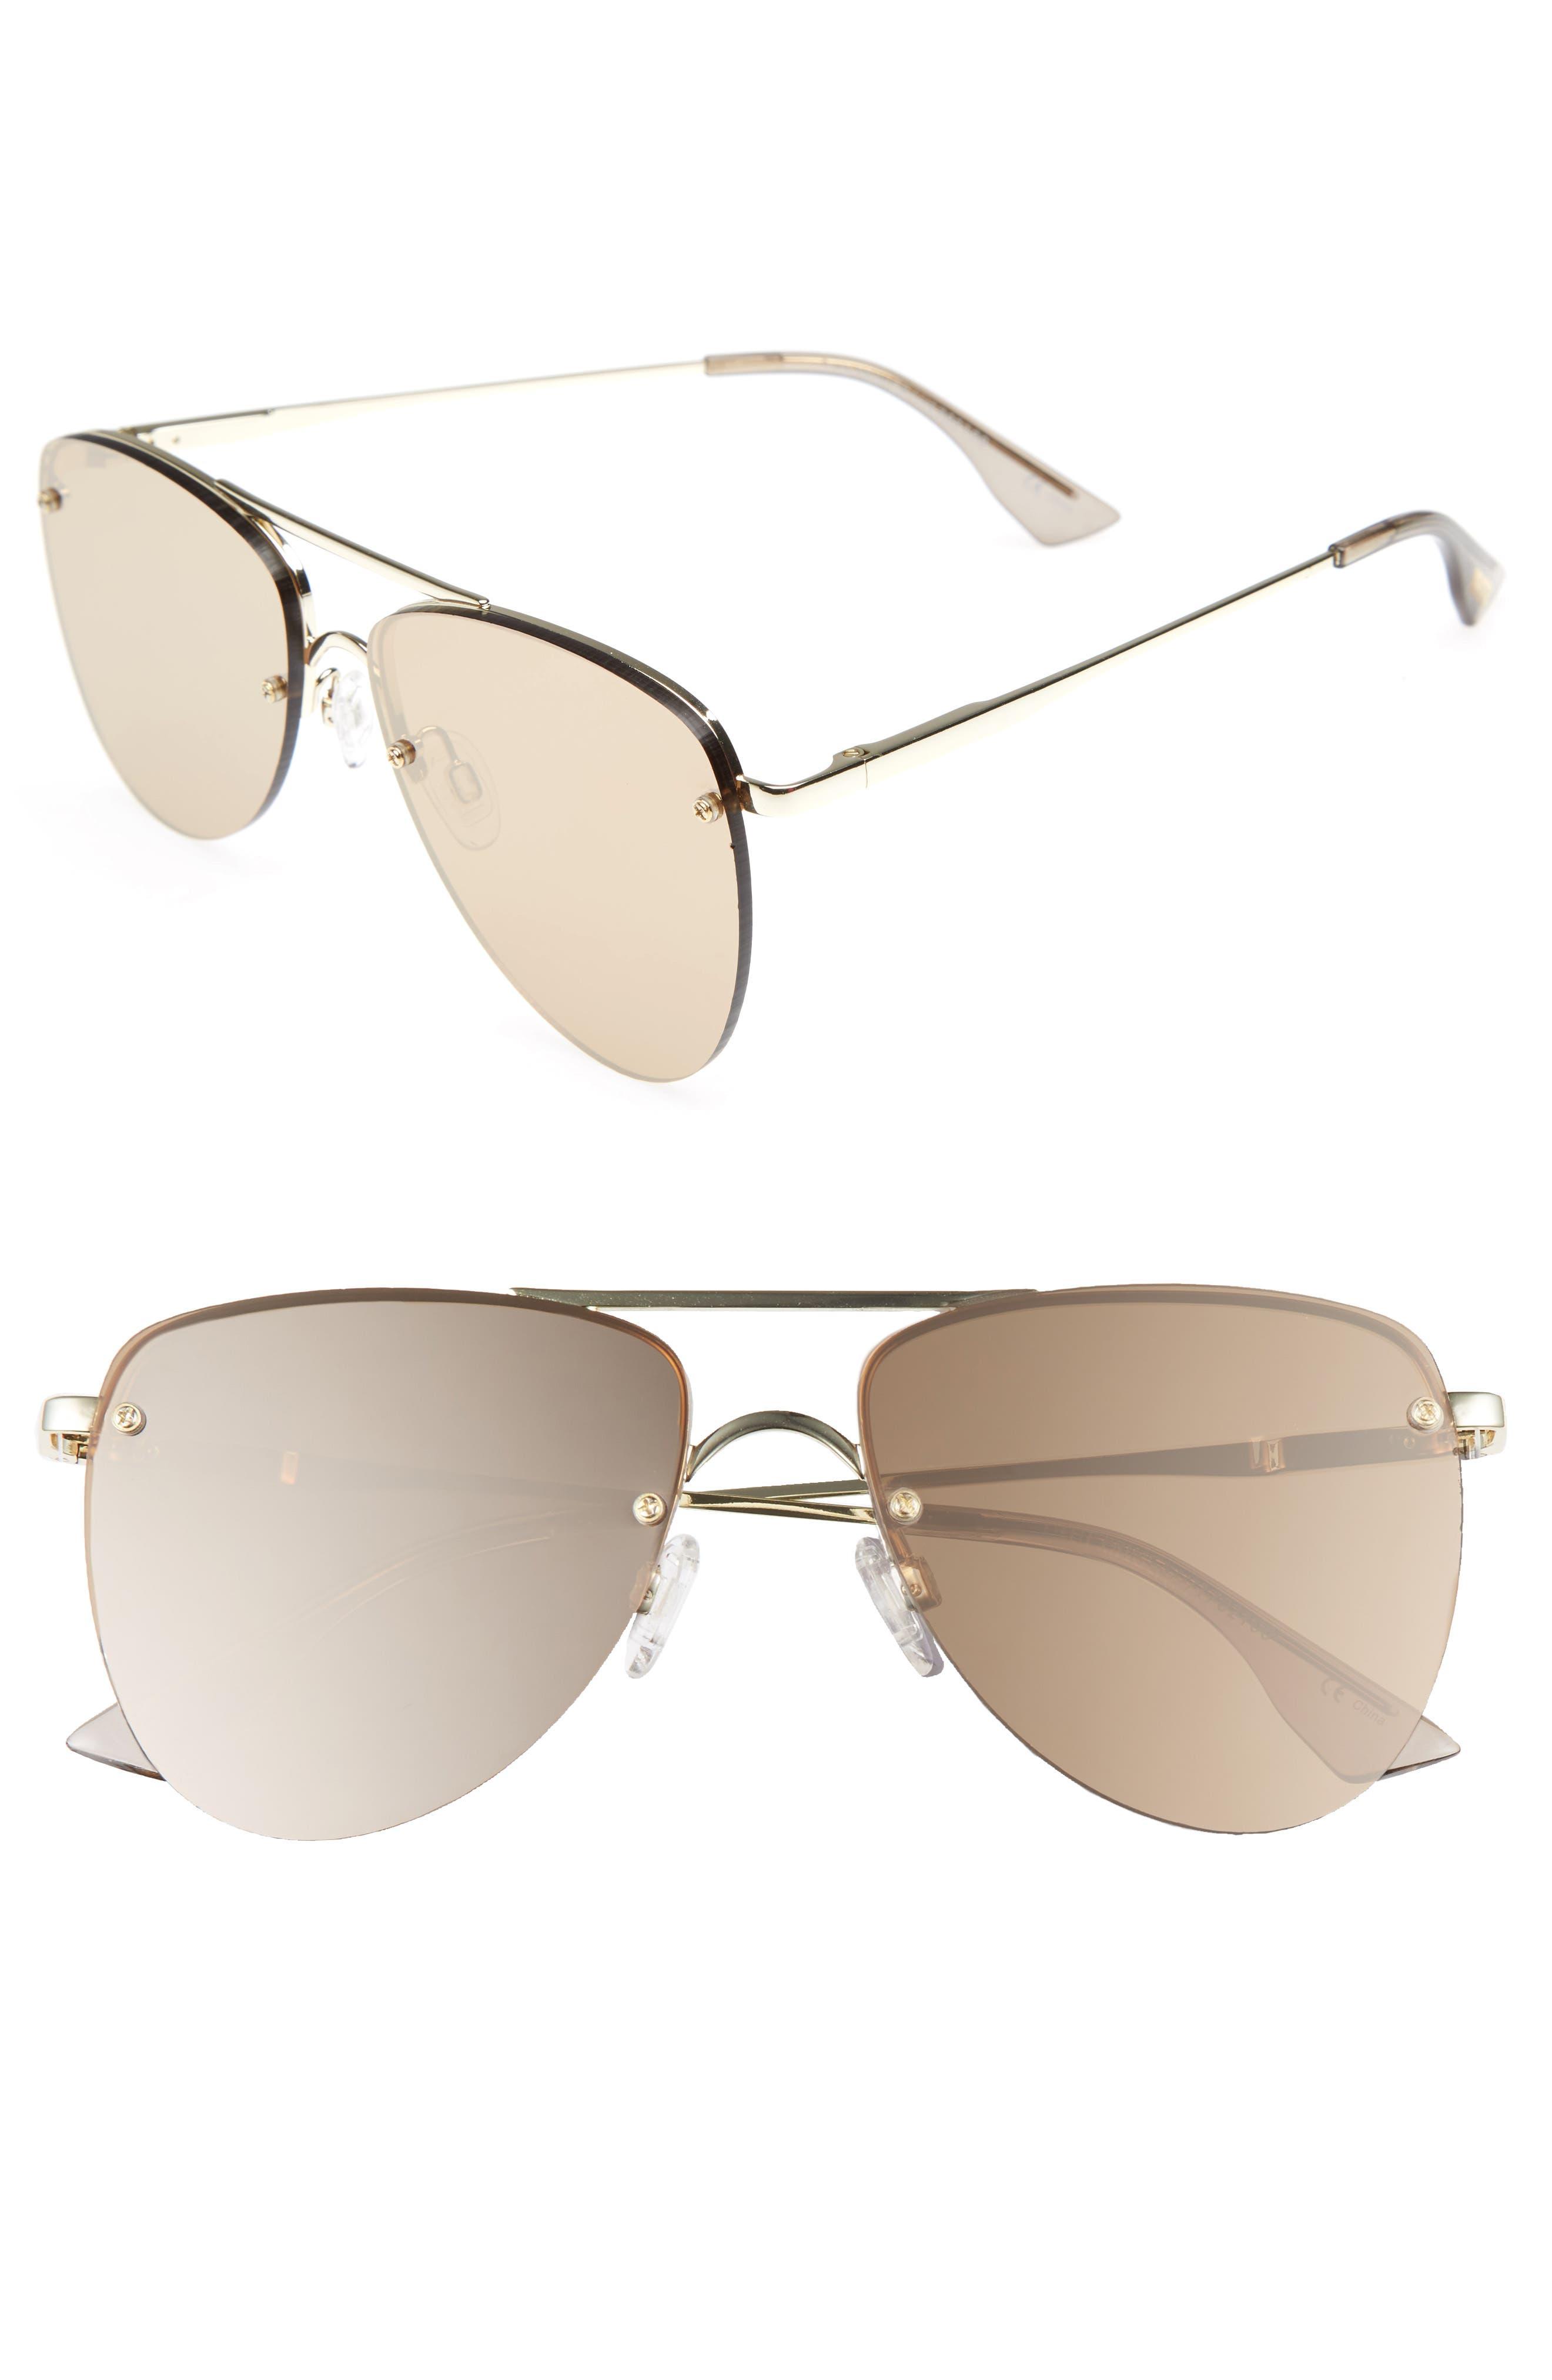 The Prince 59mm Mirrored Rimless Aviator Sunglasses,                         Main,                         color, Light Gold